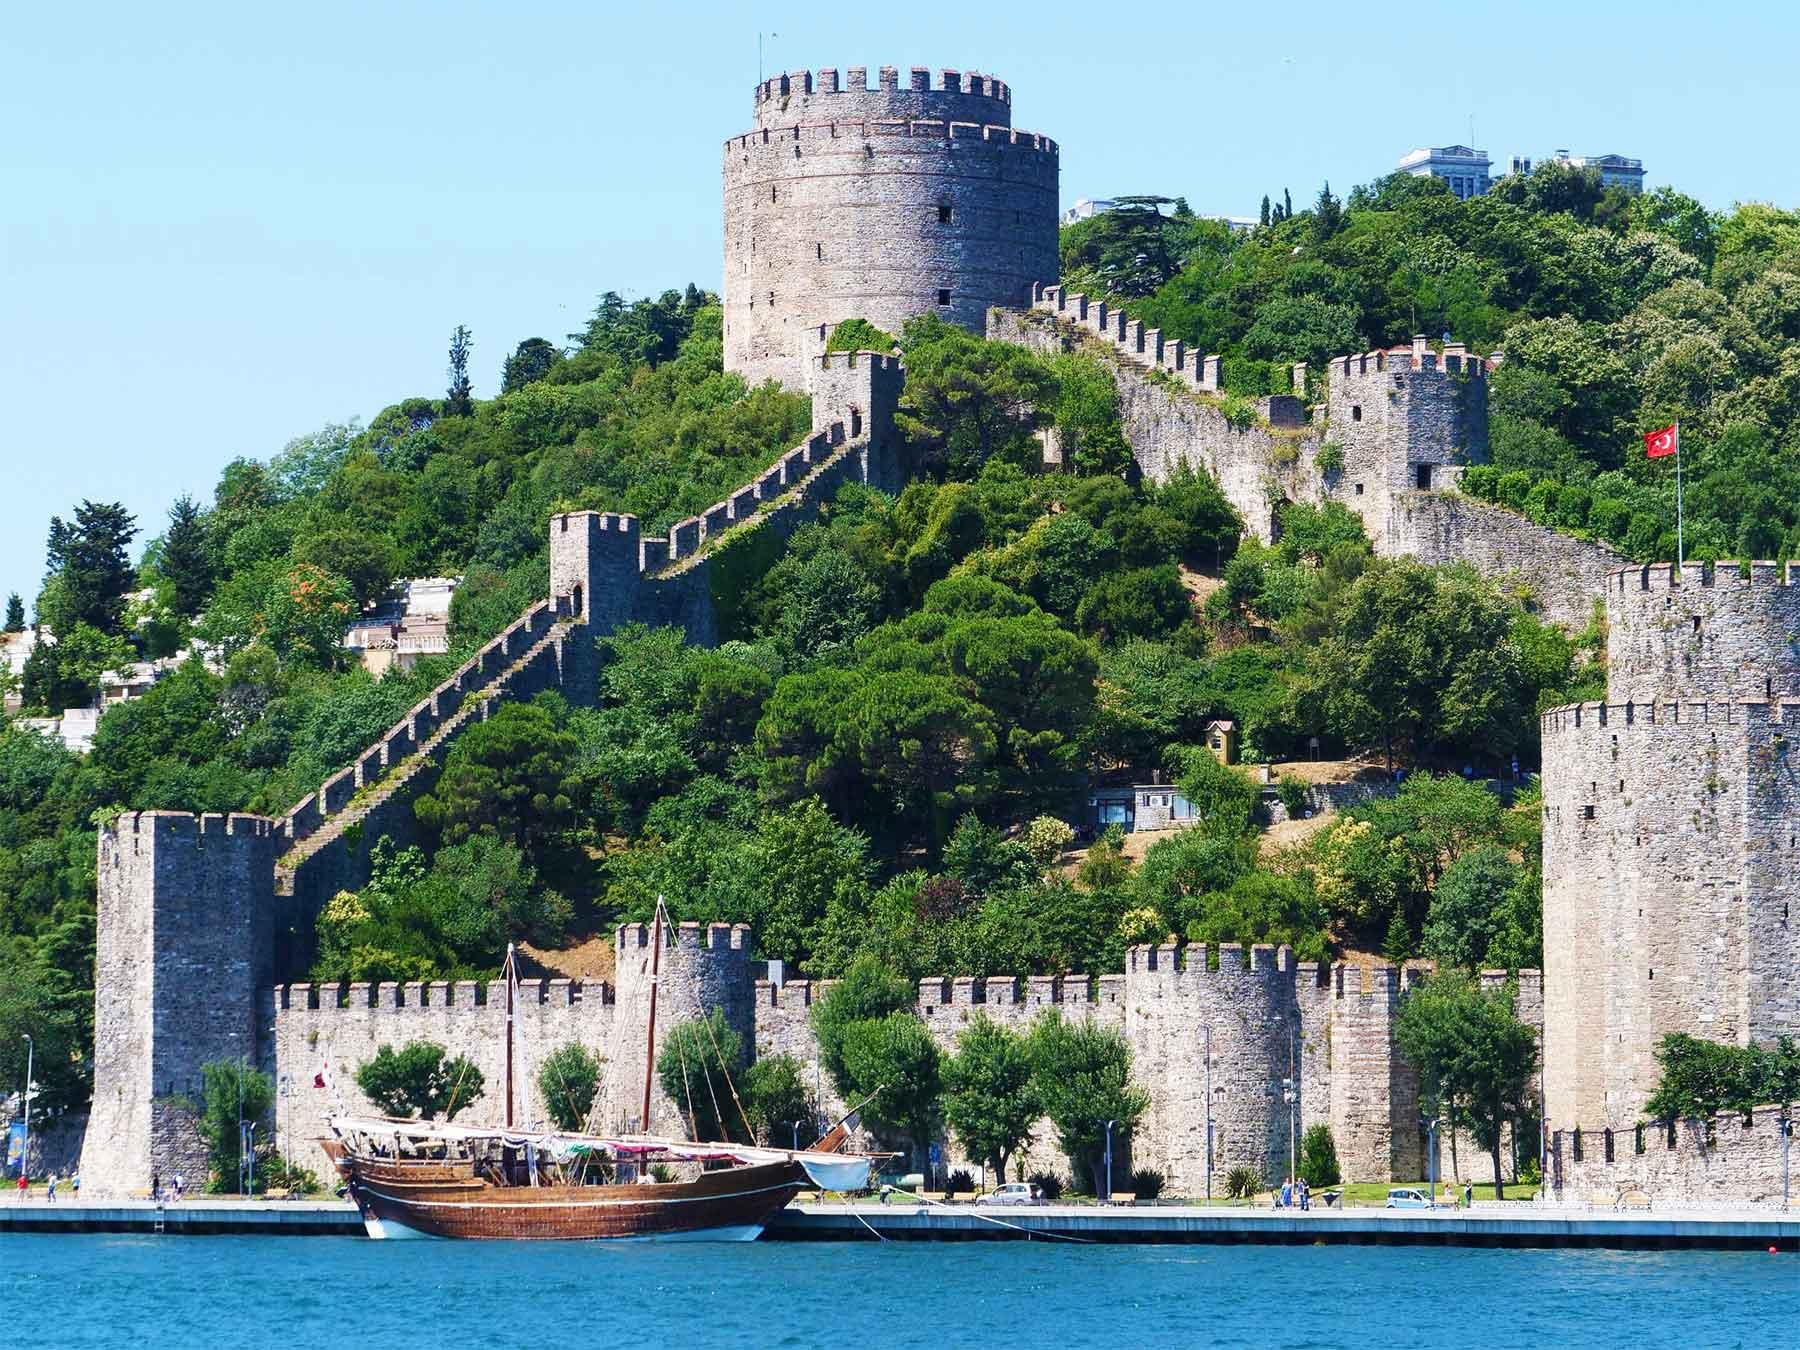 Rumelihisari Bosphorus Rumelian Castle 1492 Turkey | Professor Steven Andrew Martin | 1452  Ottoman Sultan Mehmed the Conqueror (Mehmed II)